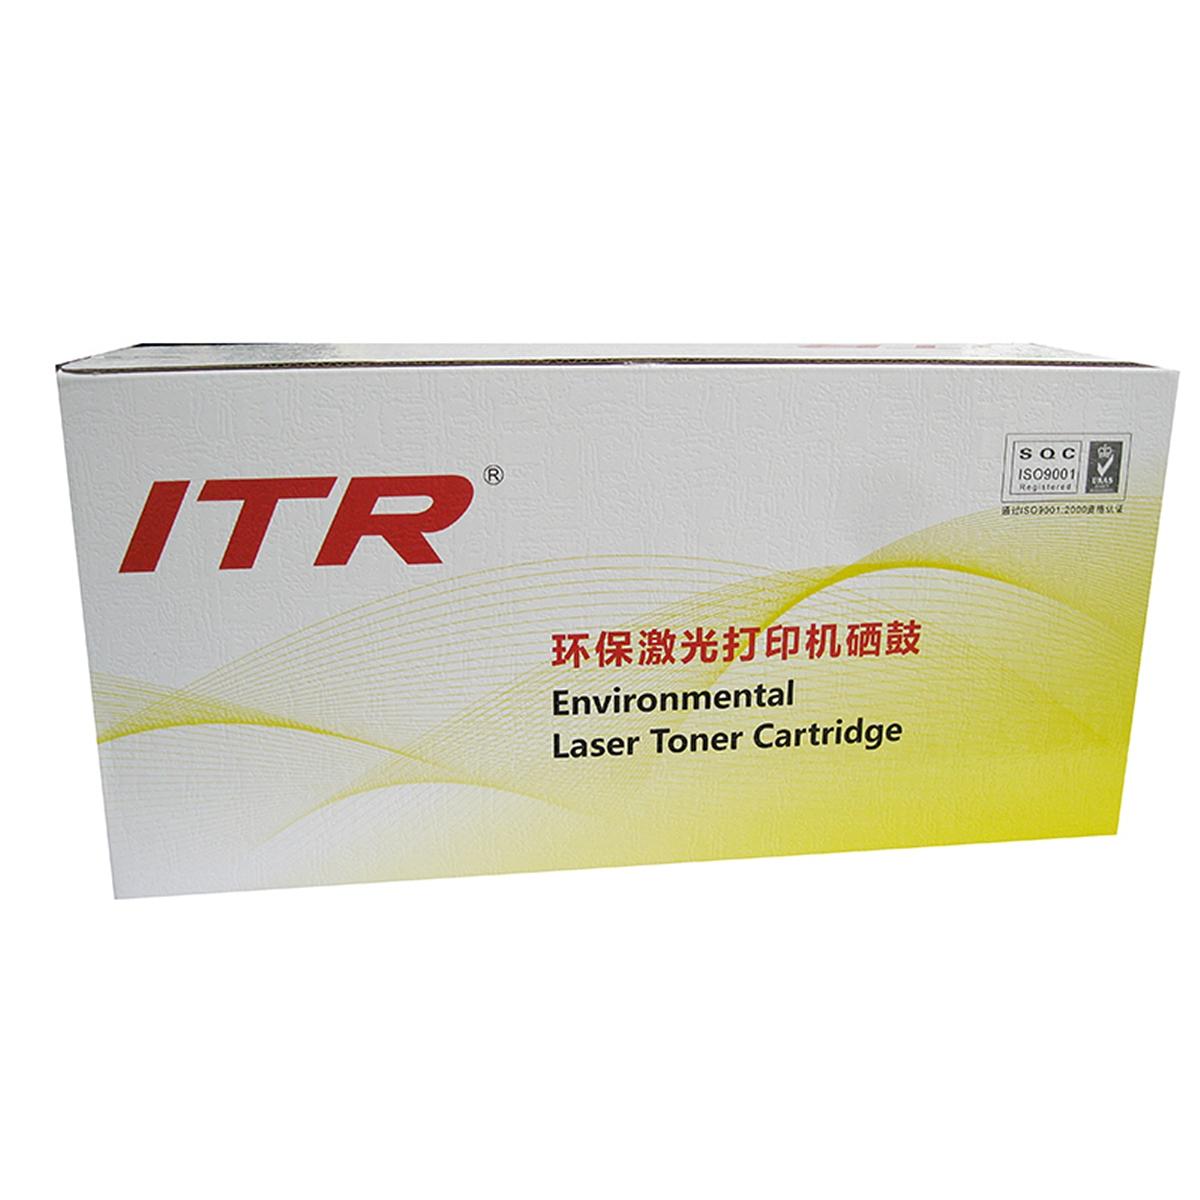 ITR-CN0492 兼容墨盒 (单位:盒) (适用于:EPSONSTYLUSPHOTOR210/R230/R310/RX510/RX630/R350)